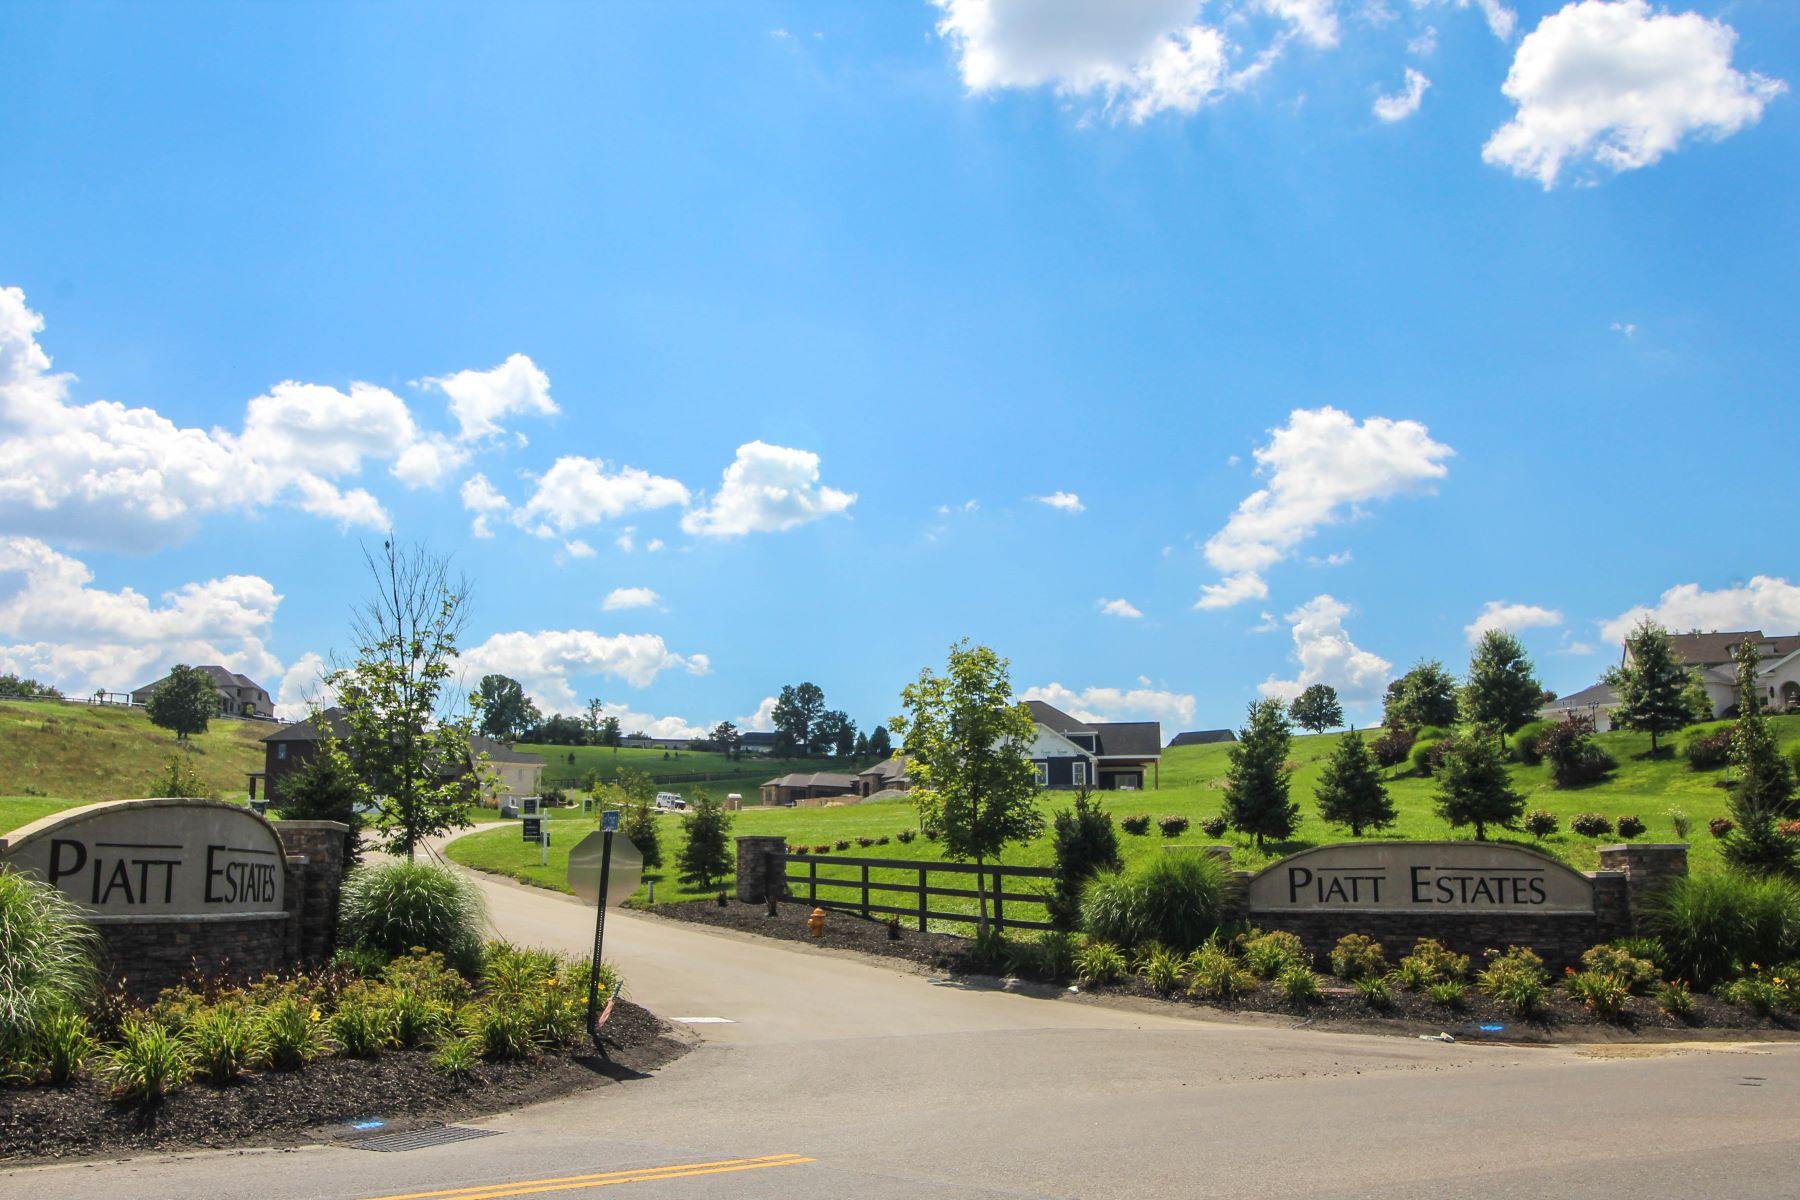 Additional photo for property listing at Piatt Estates Home Site - Lot 102R 102 Piatt Estates Drive Lot 102R Washington, Pennsylvania 15301 United States